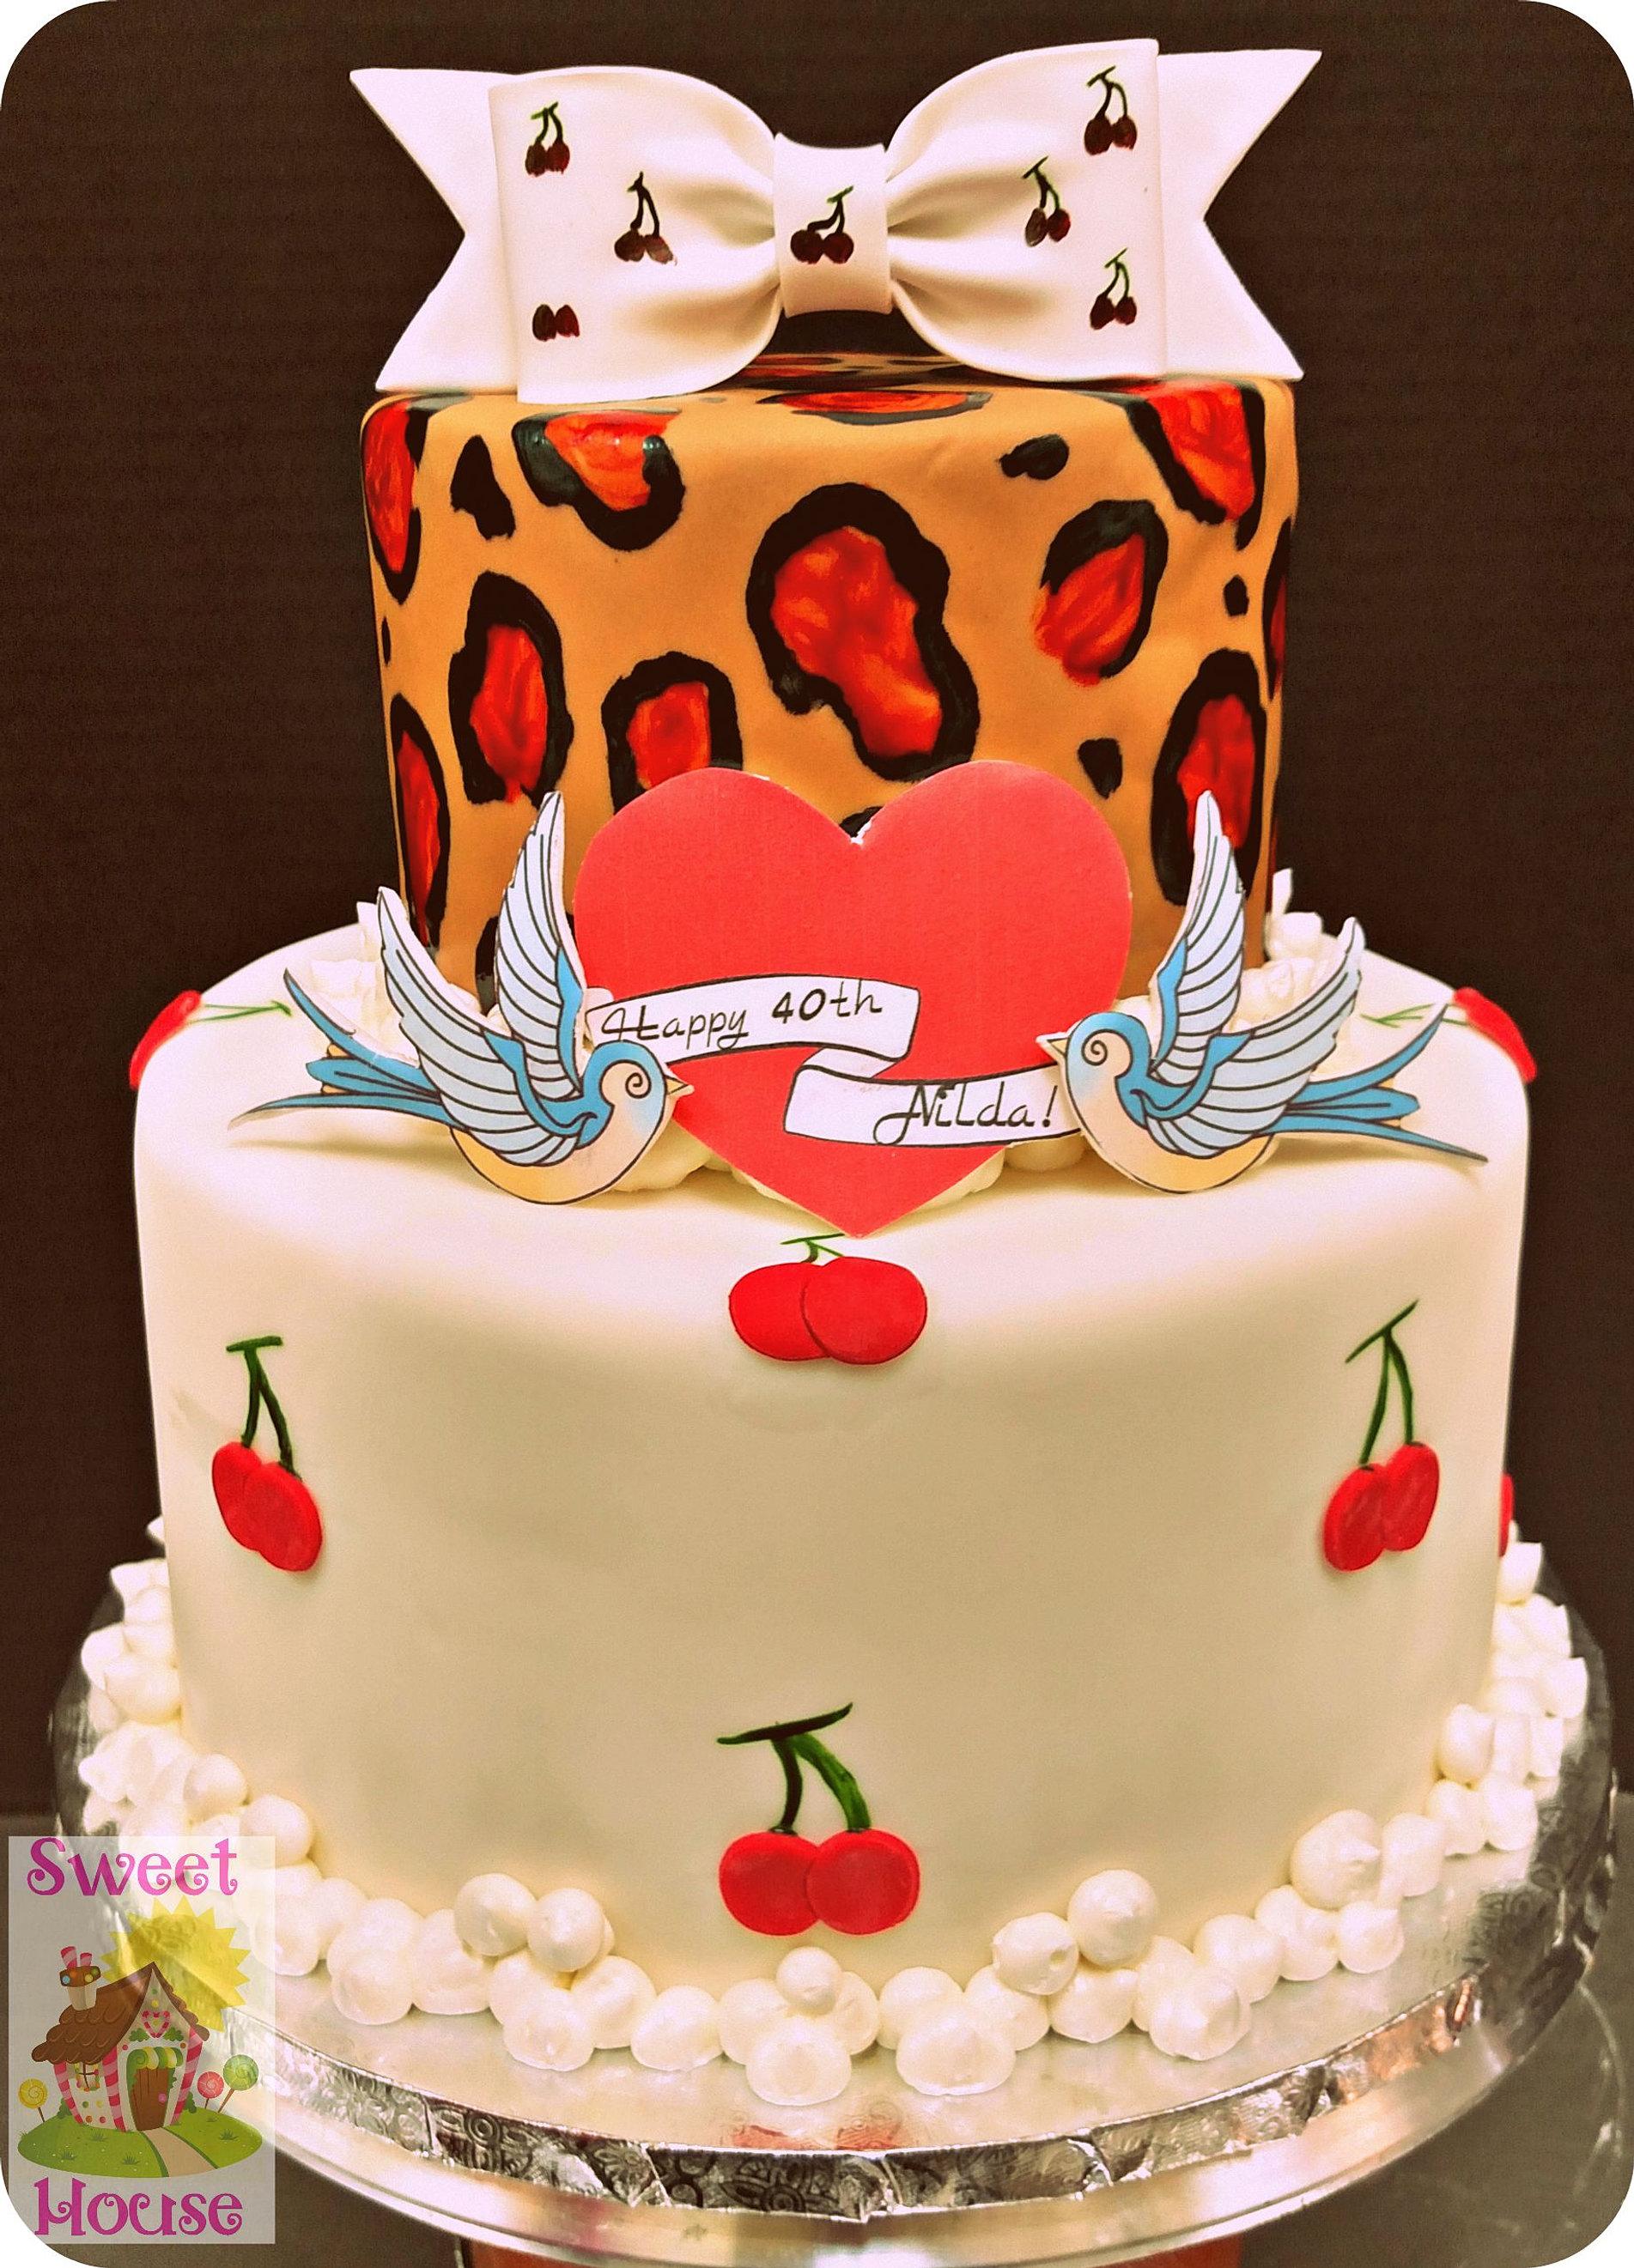 Sweet House Cake Supply  Bakery Birthday Cakes - Rockabilly birthday cake